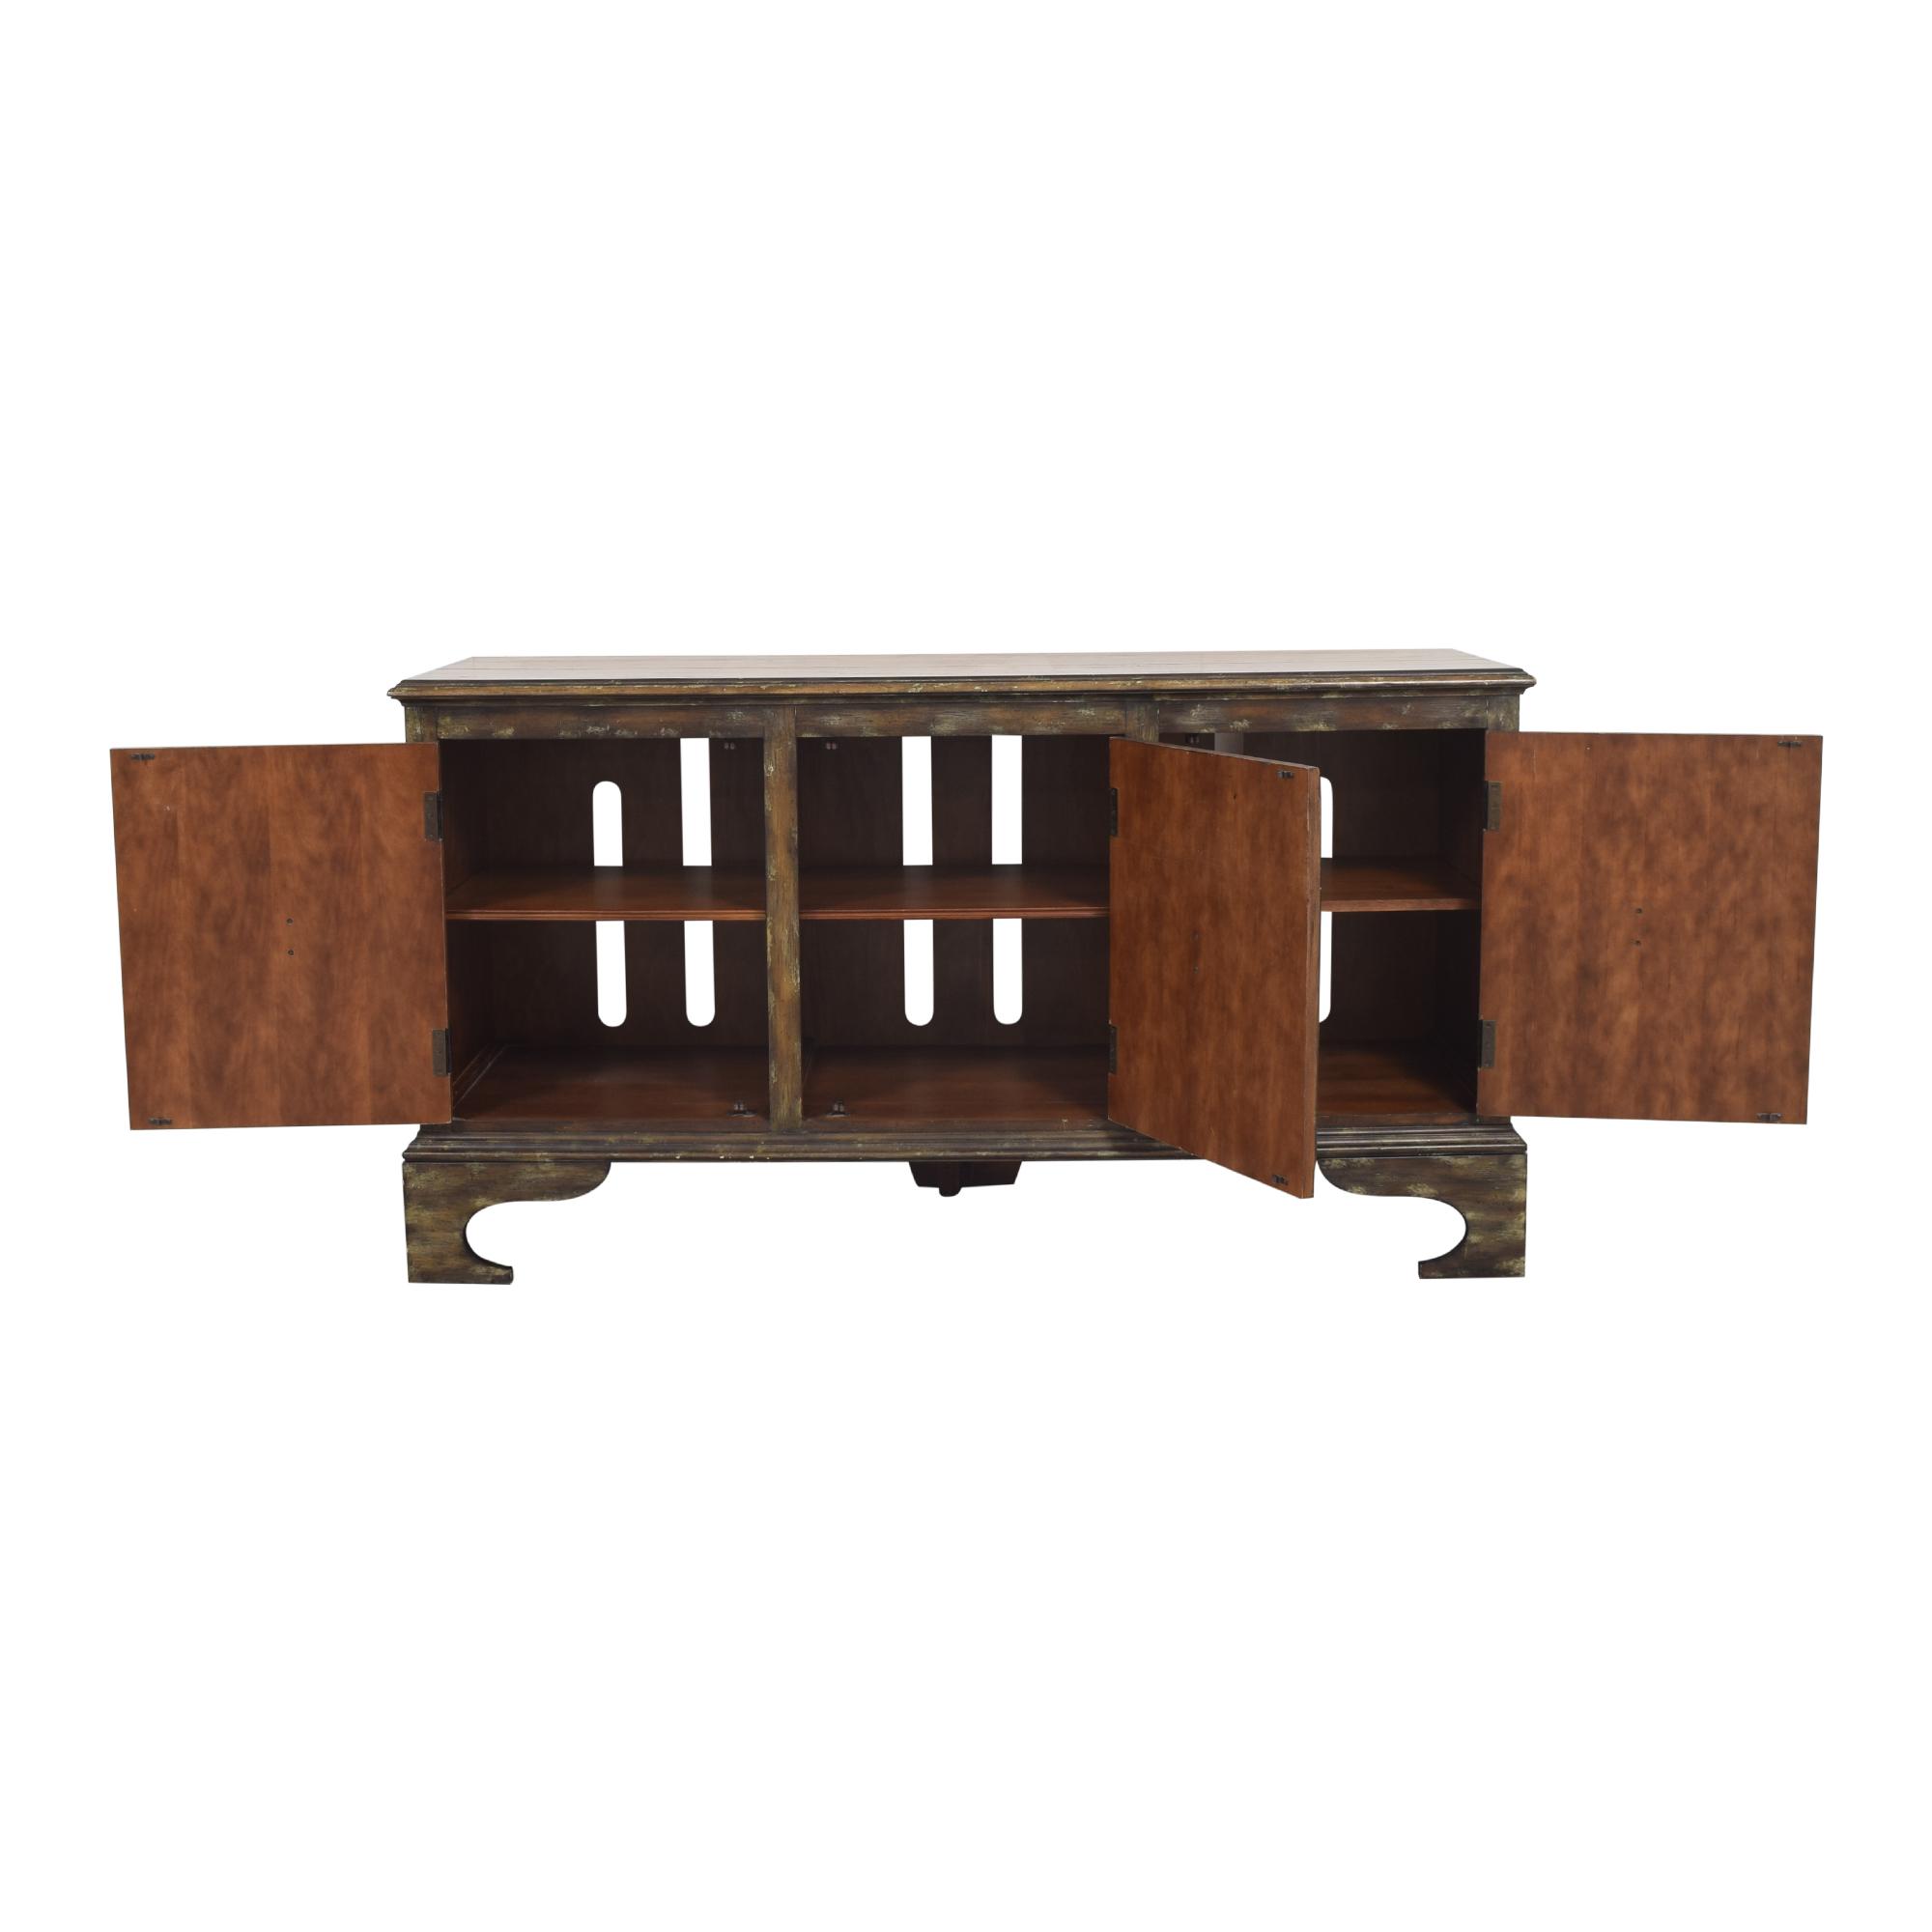 Hooker Furniture Hooker Furniture Three Door Sideboard pa